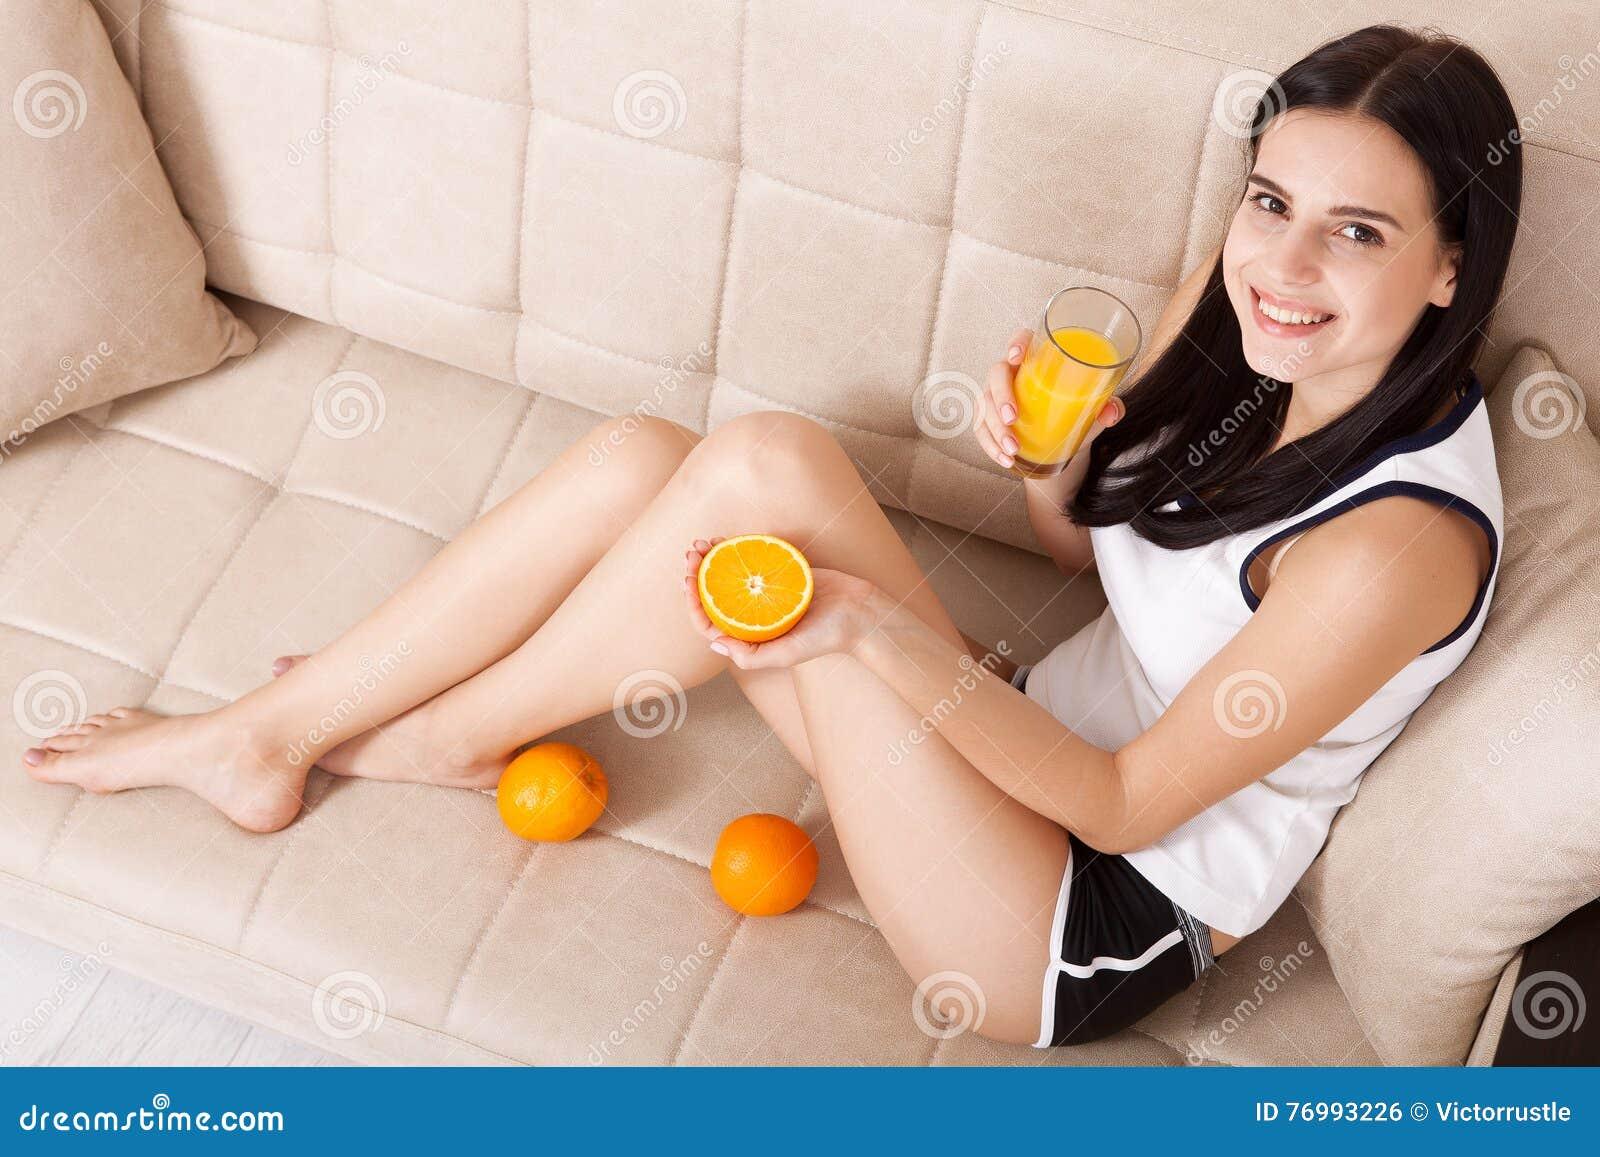 Woman drinking orange juice Beautiful mixed-race Asian, Caucasian model. Unusually, top view.